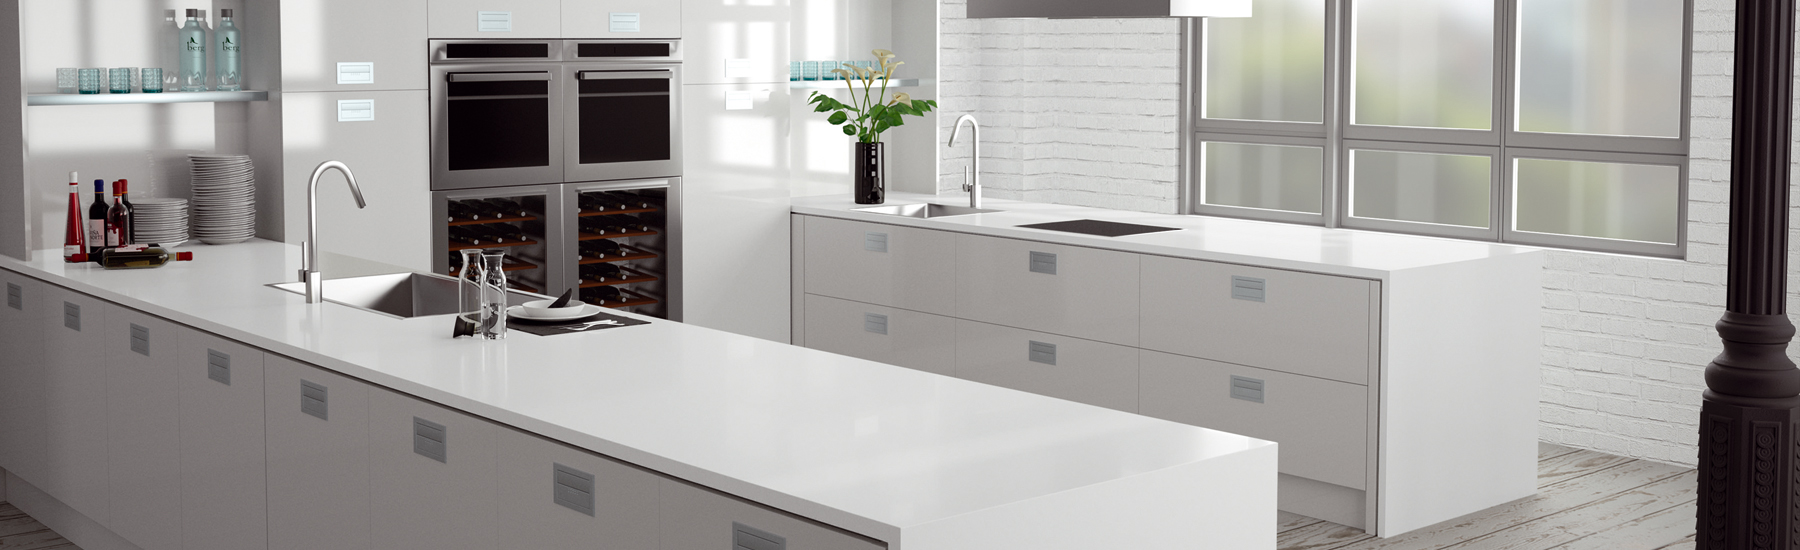 Absolute Blanc White Quartz Model 3